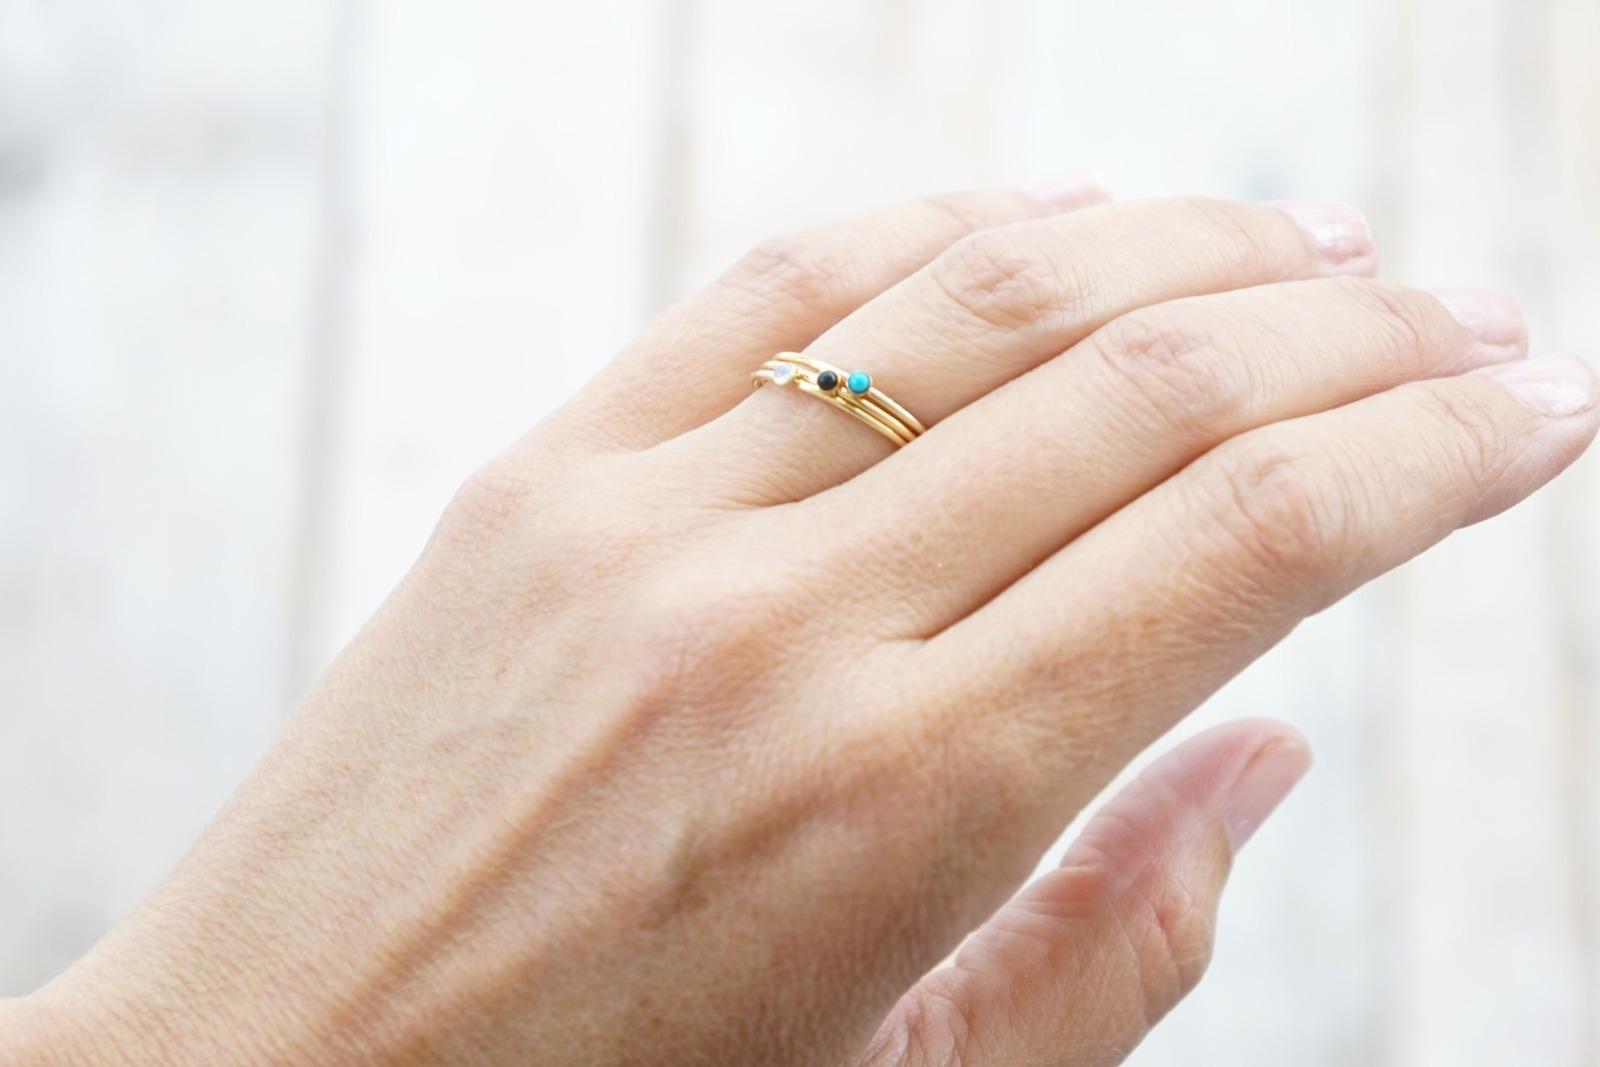 Zierlicher Ring Stapelring vergoldet Rosa Opal - 4